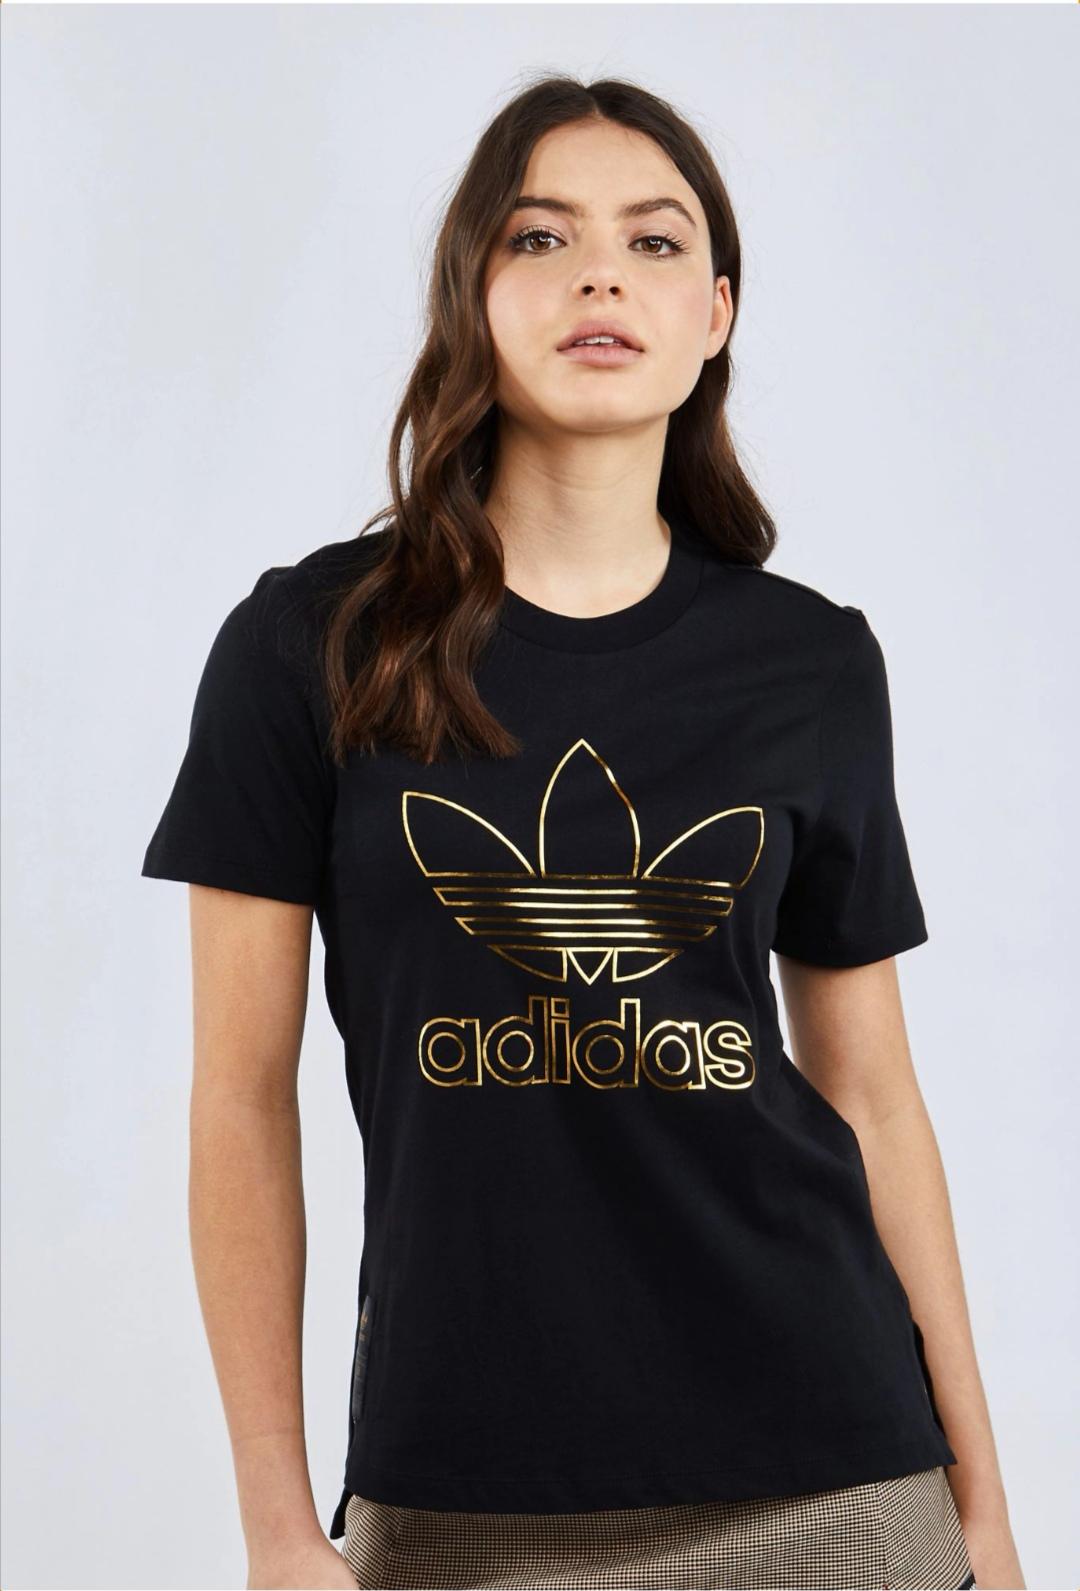 Adidas Superstar - Mujer T-Shirts Tallas 34, 36 y 38